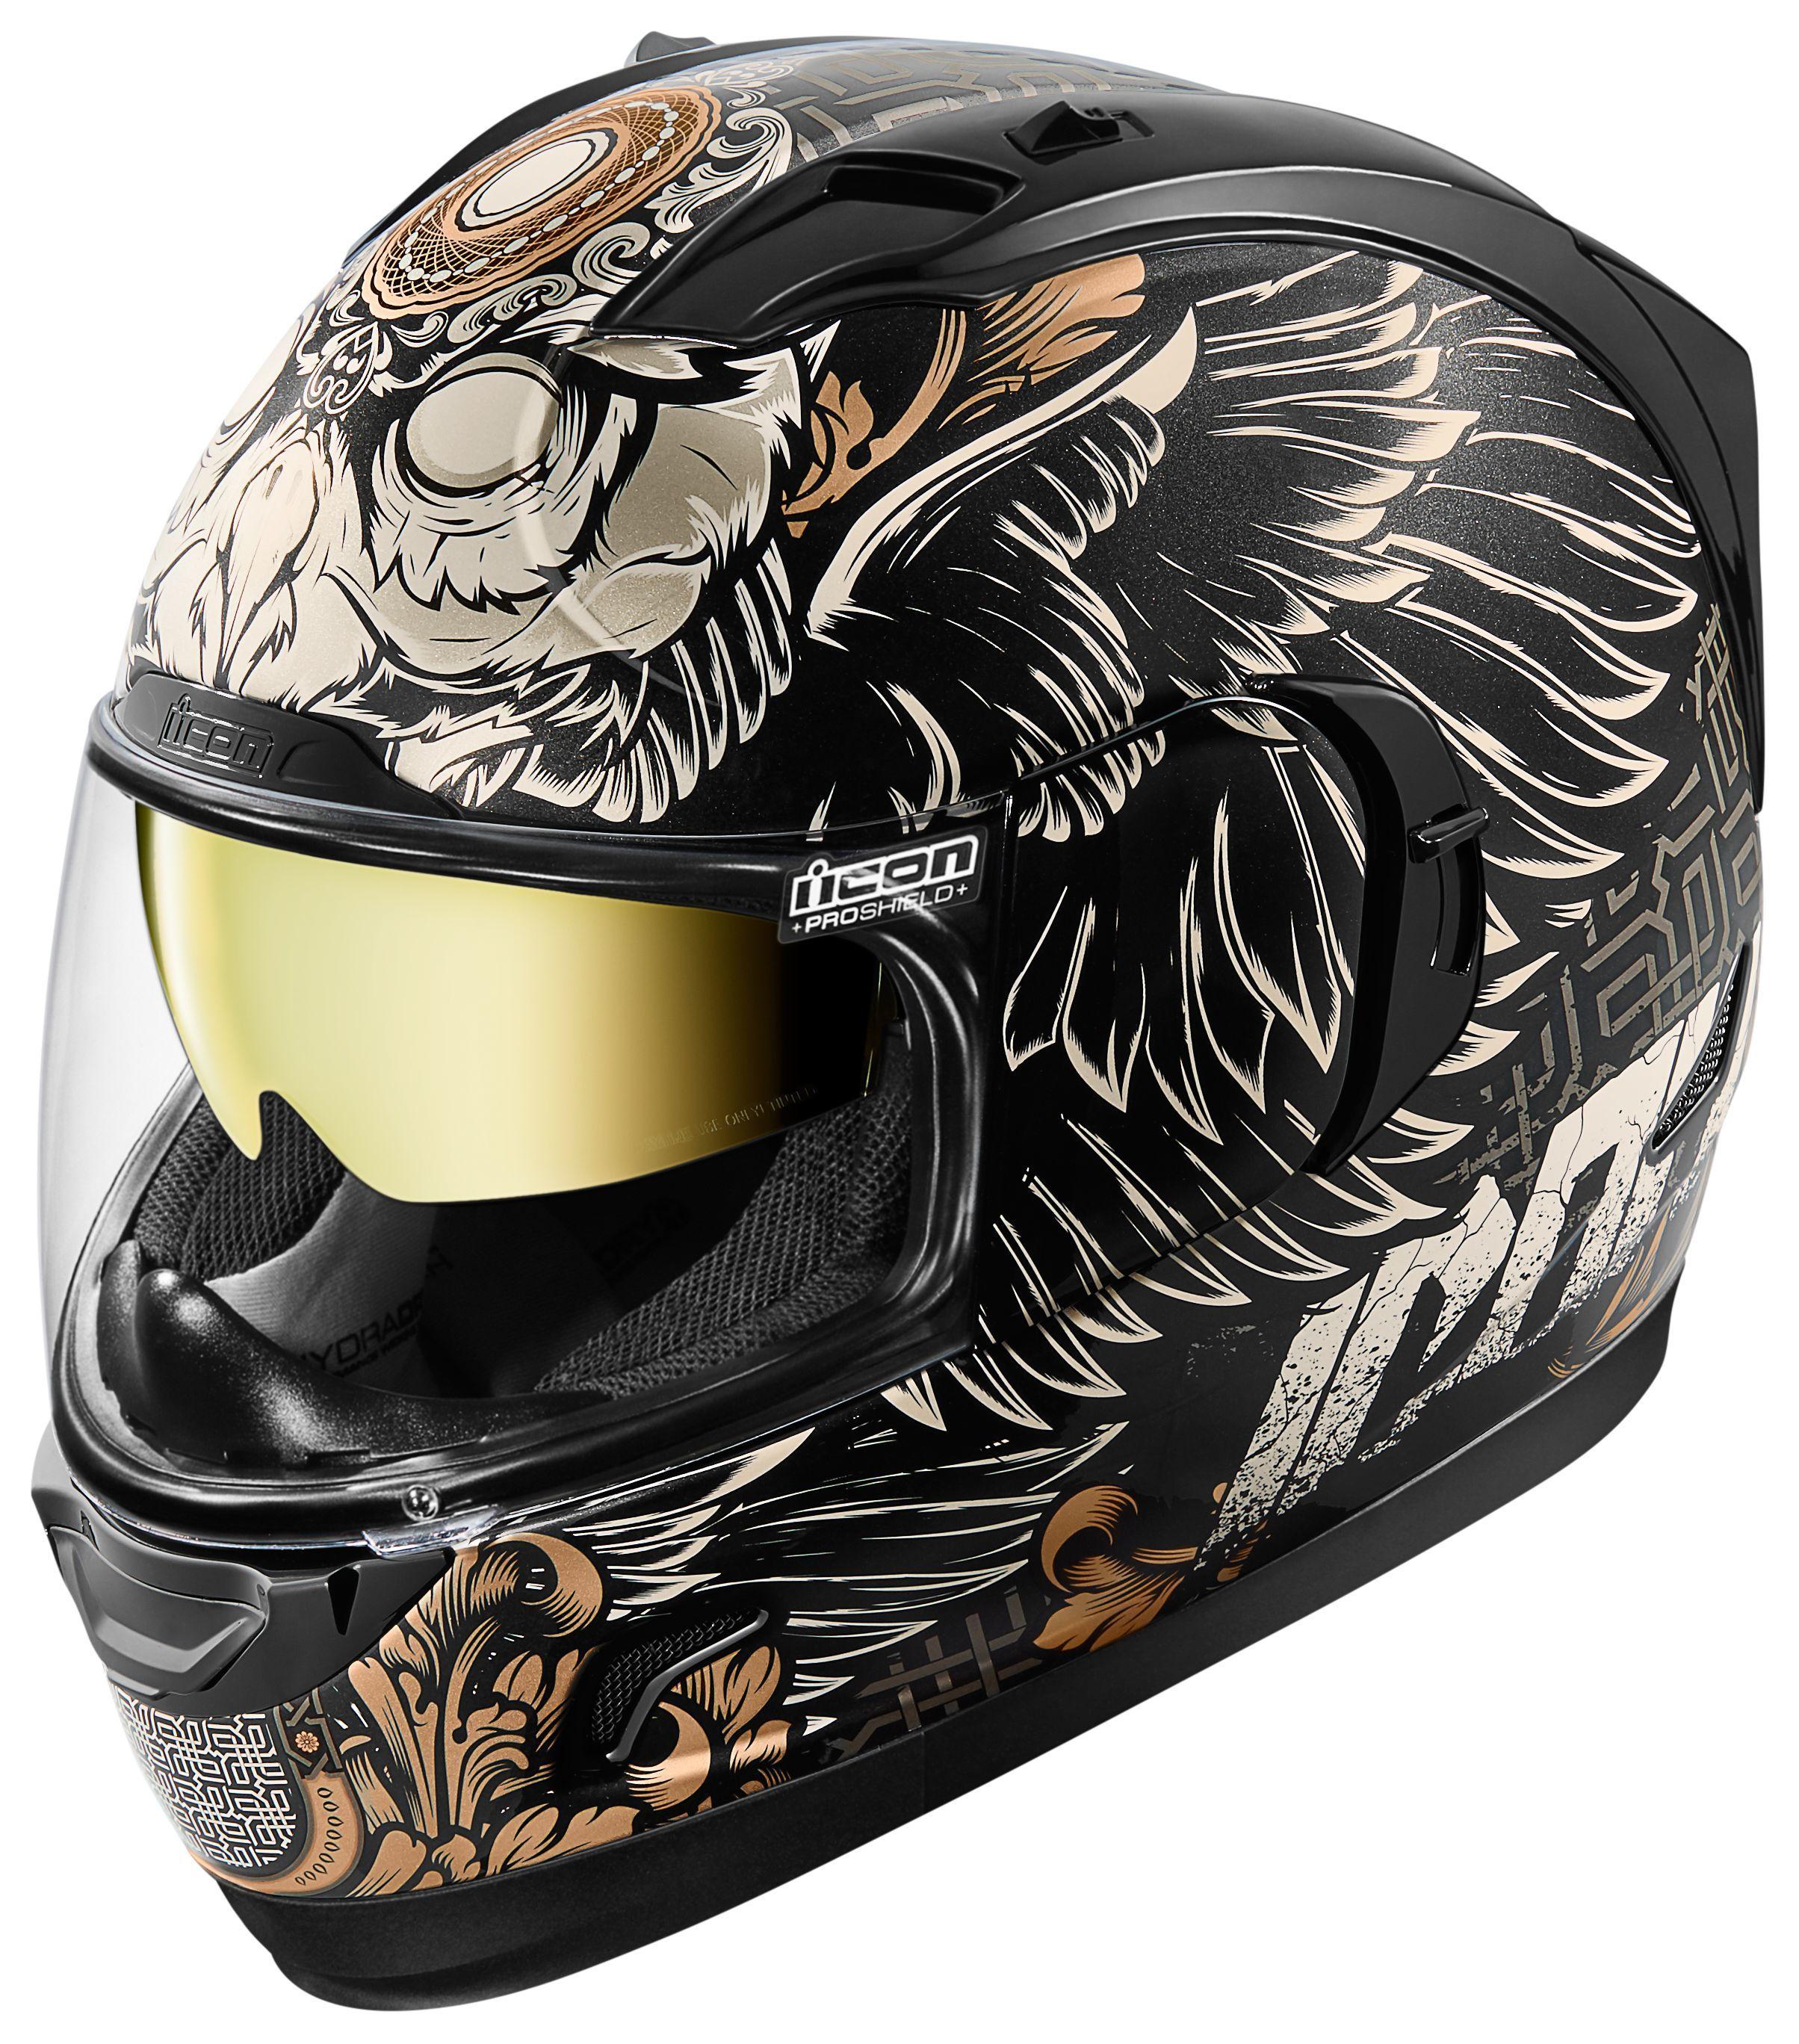 Icon Alliance GT Watchkeeper Helmet RevZilla - Motorcycle helmet decals graphicsmotorcycle helmet graphics the easy helmet upgrade